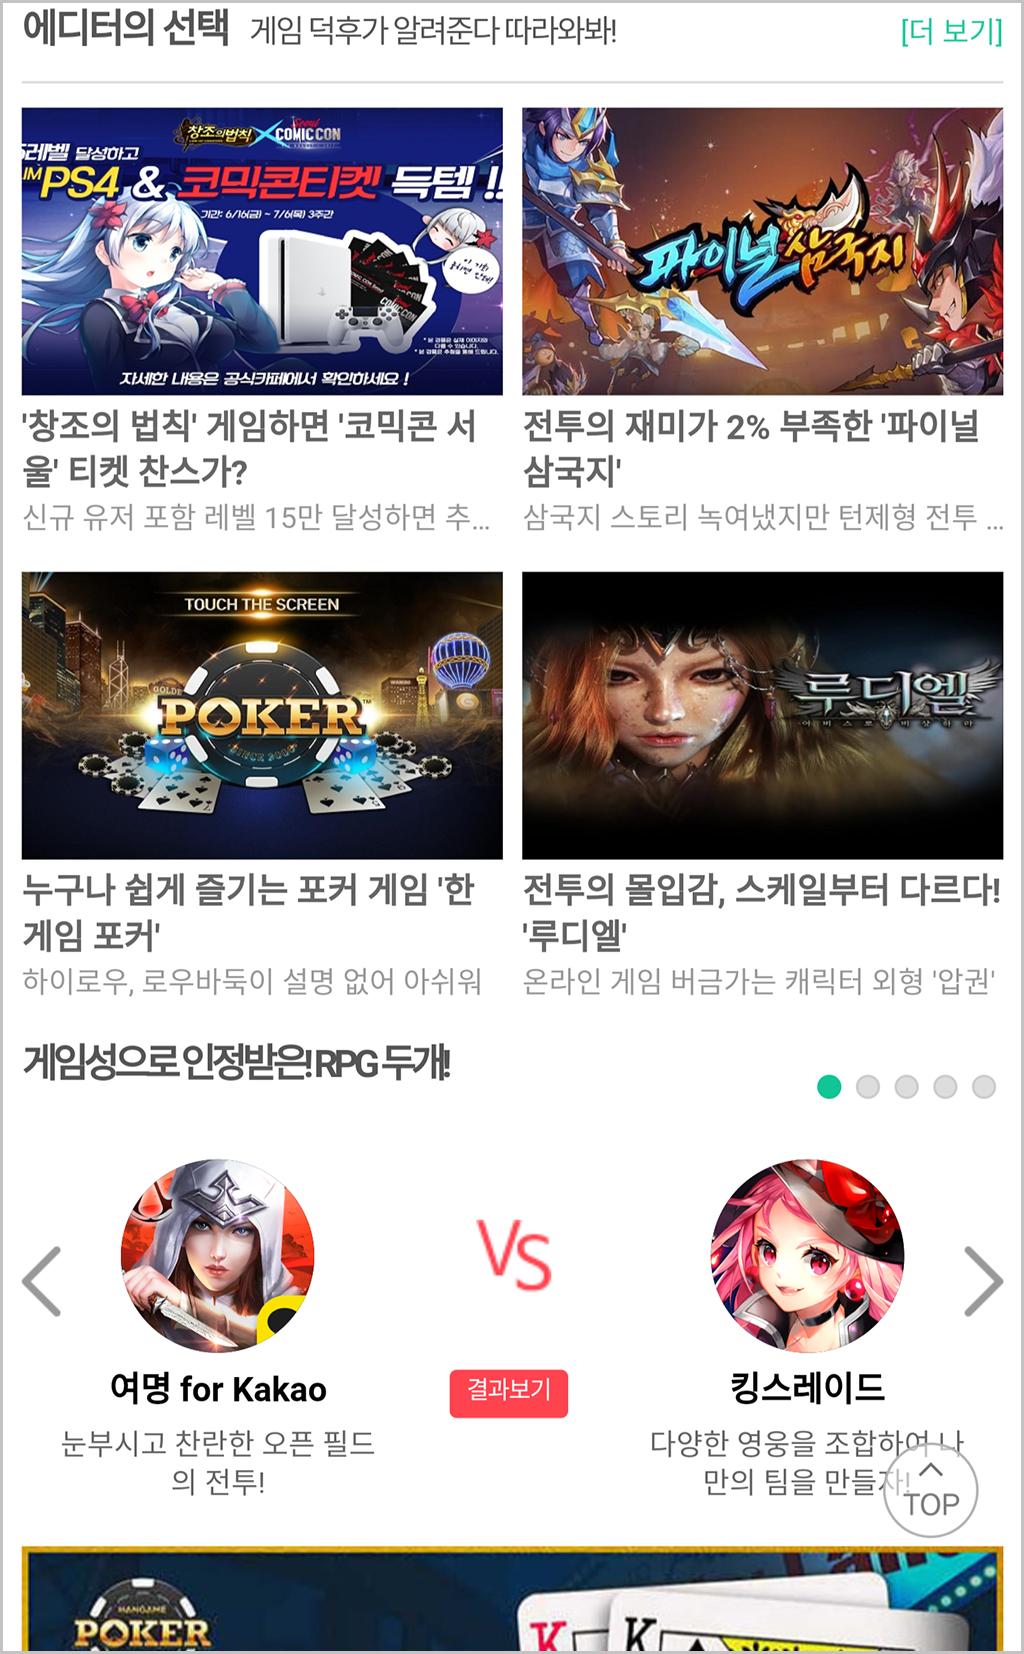 U+ Page 앱 리뷰